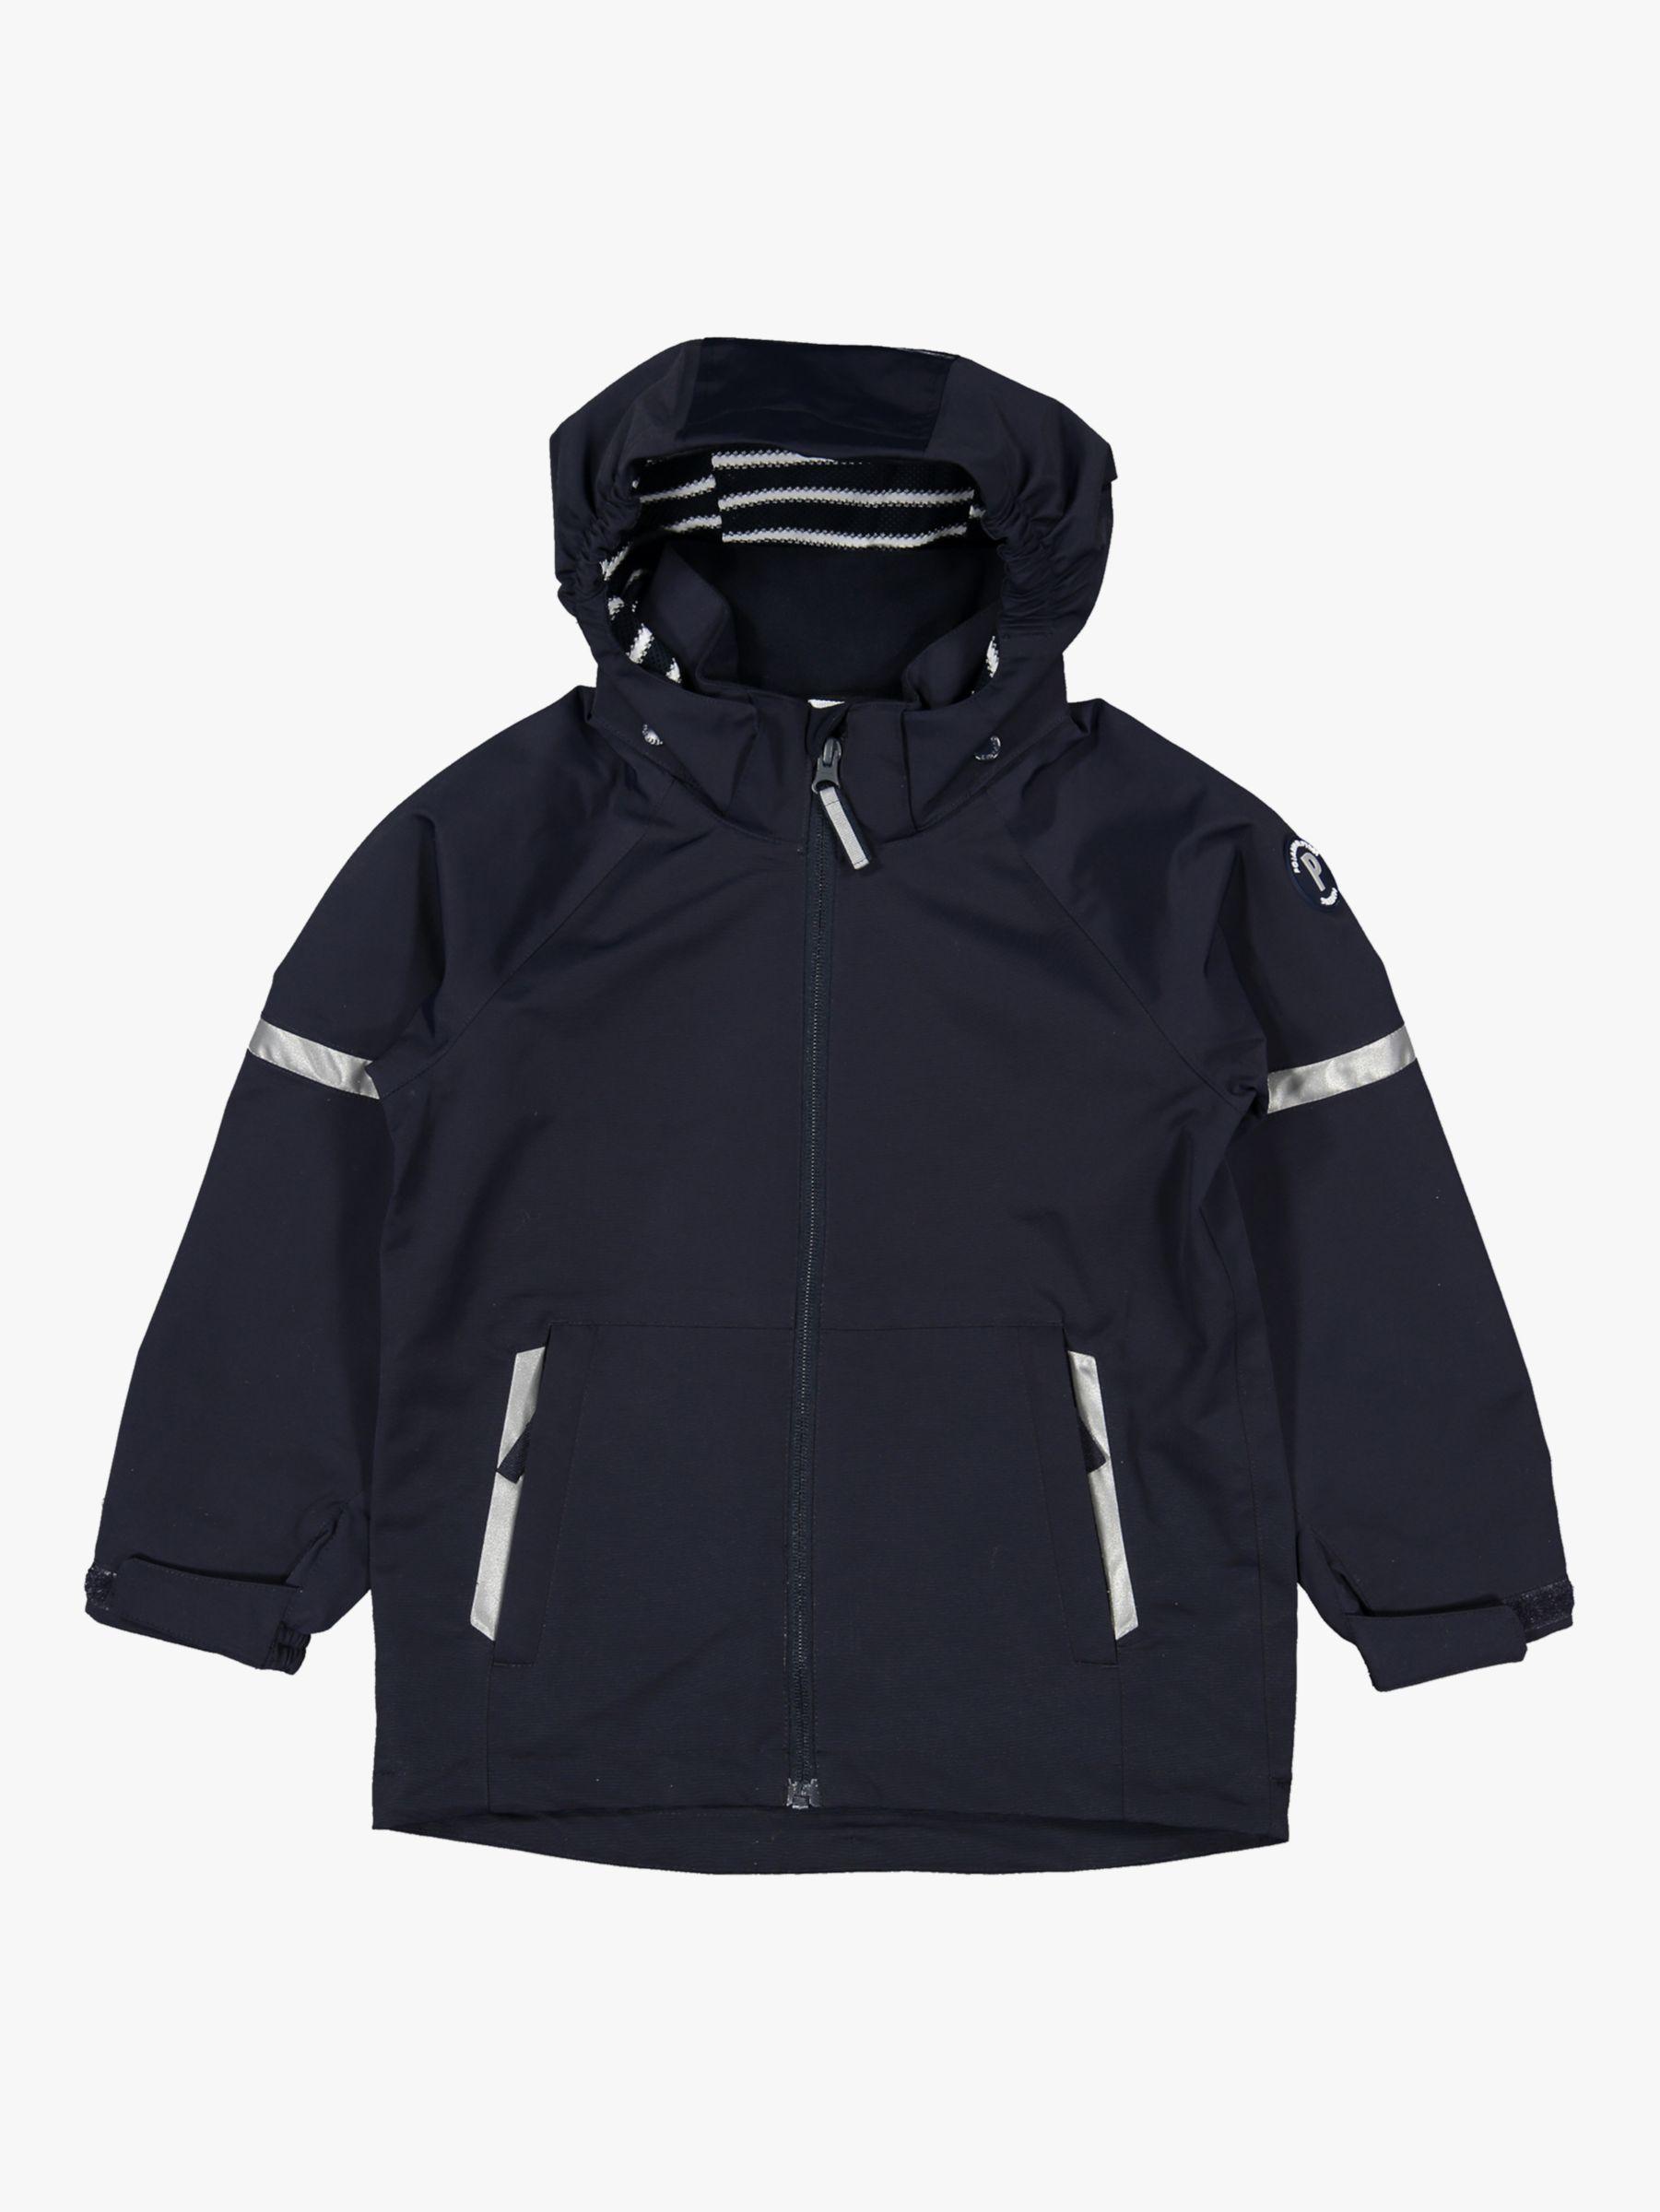 Polarn O. Pyret Children's Waterproof Shell Coat, Dark Blue